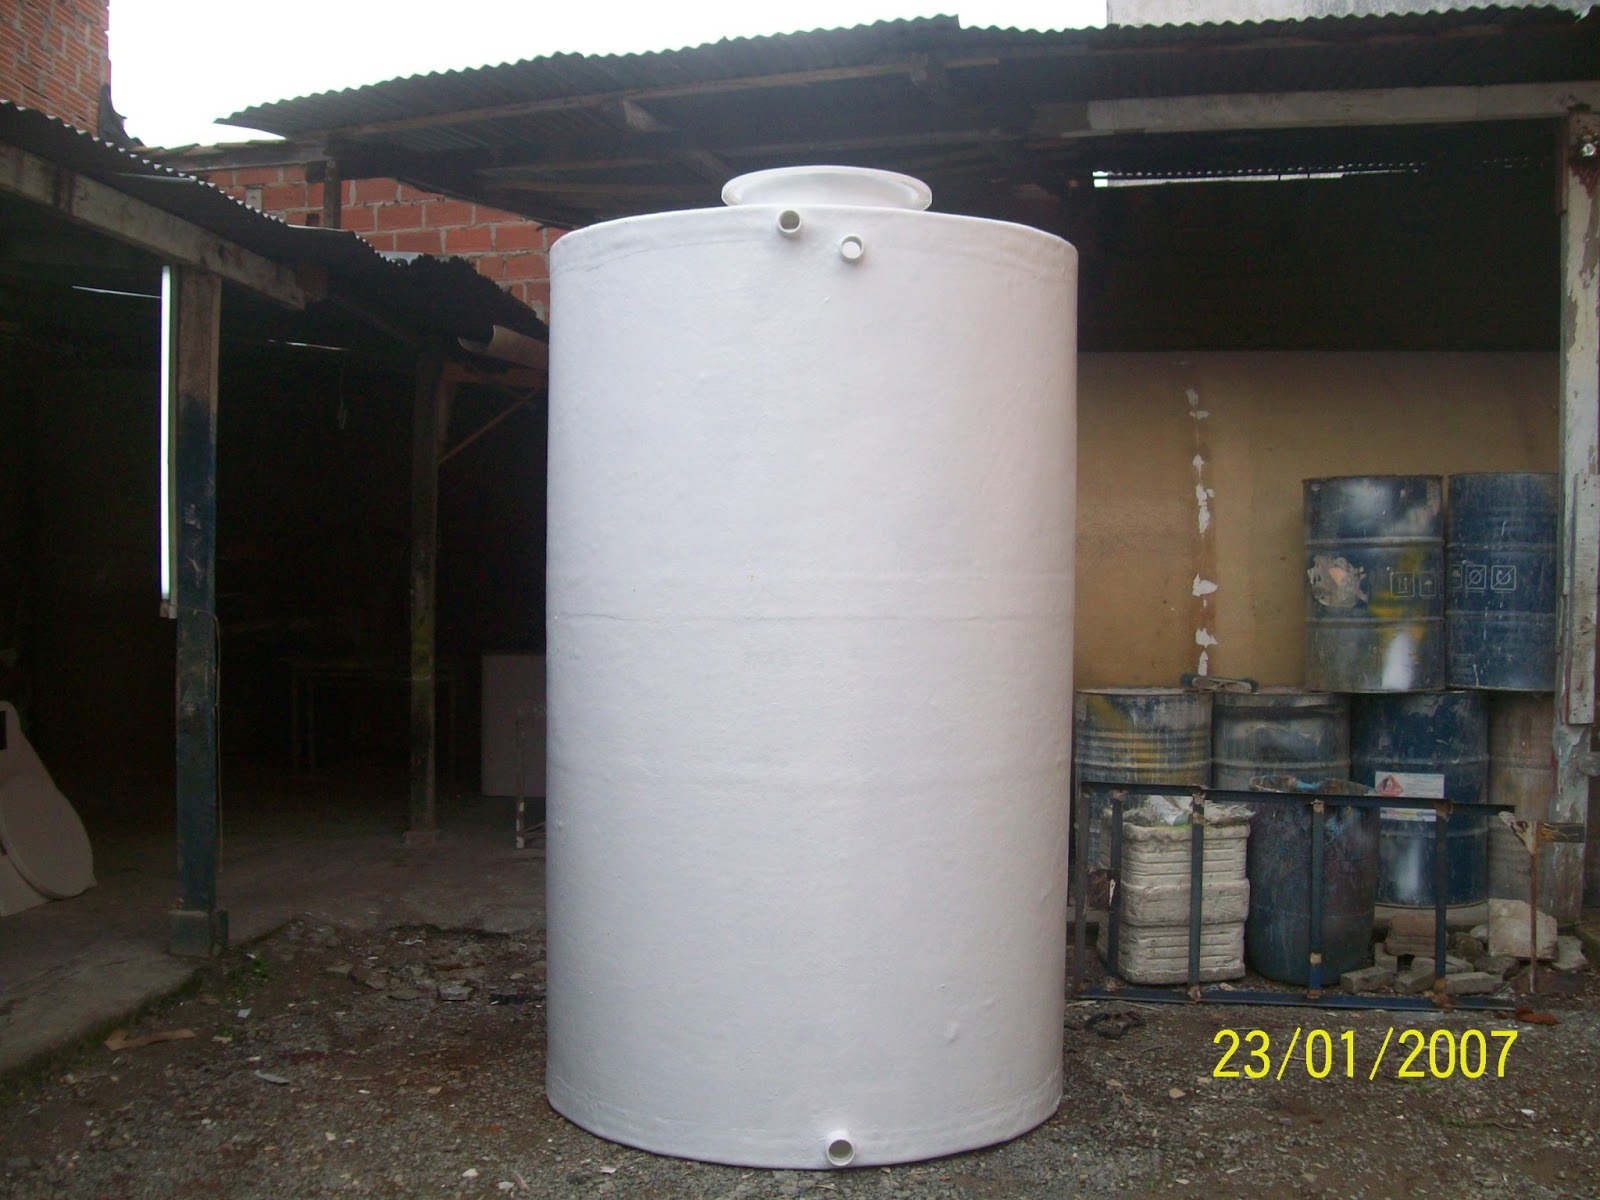 Tanques para almacenamiento de agua fibras waz for Estanque de agua 10000 litros precio